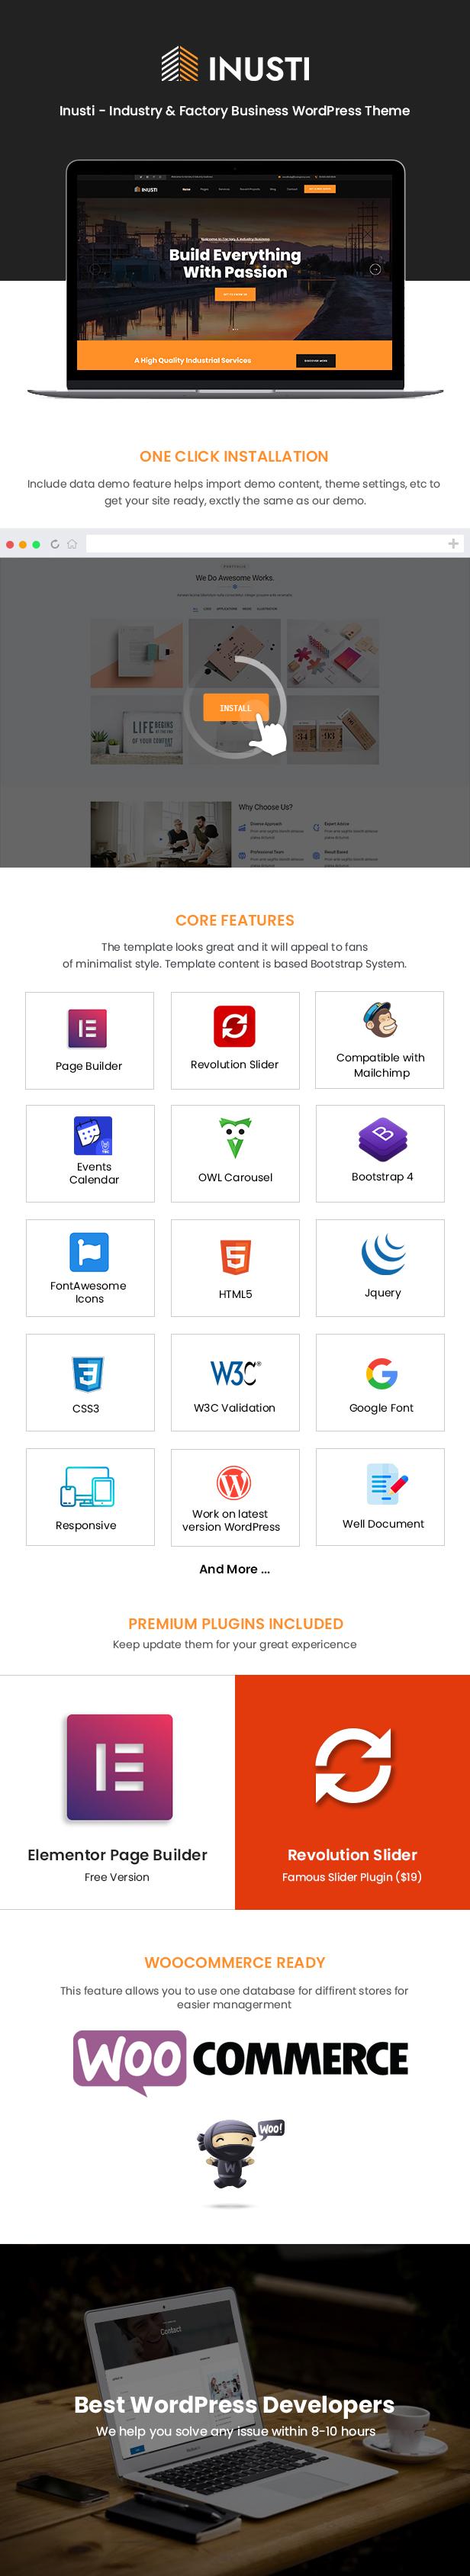 Inusti WordPress Theme